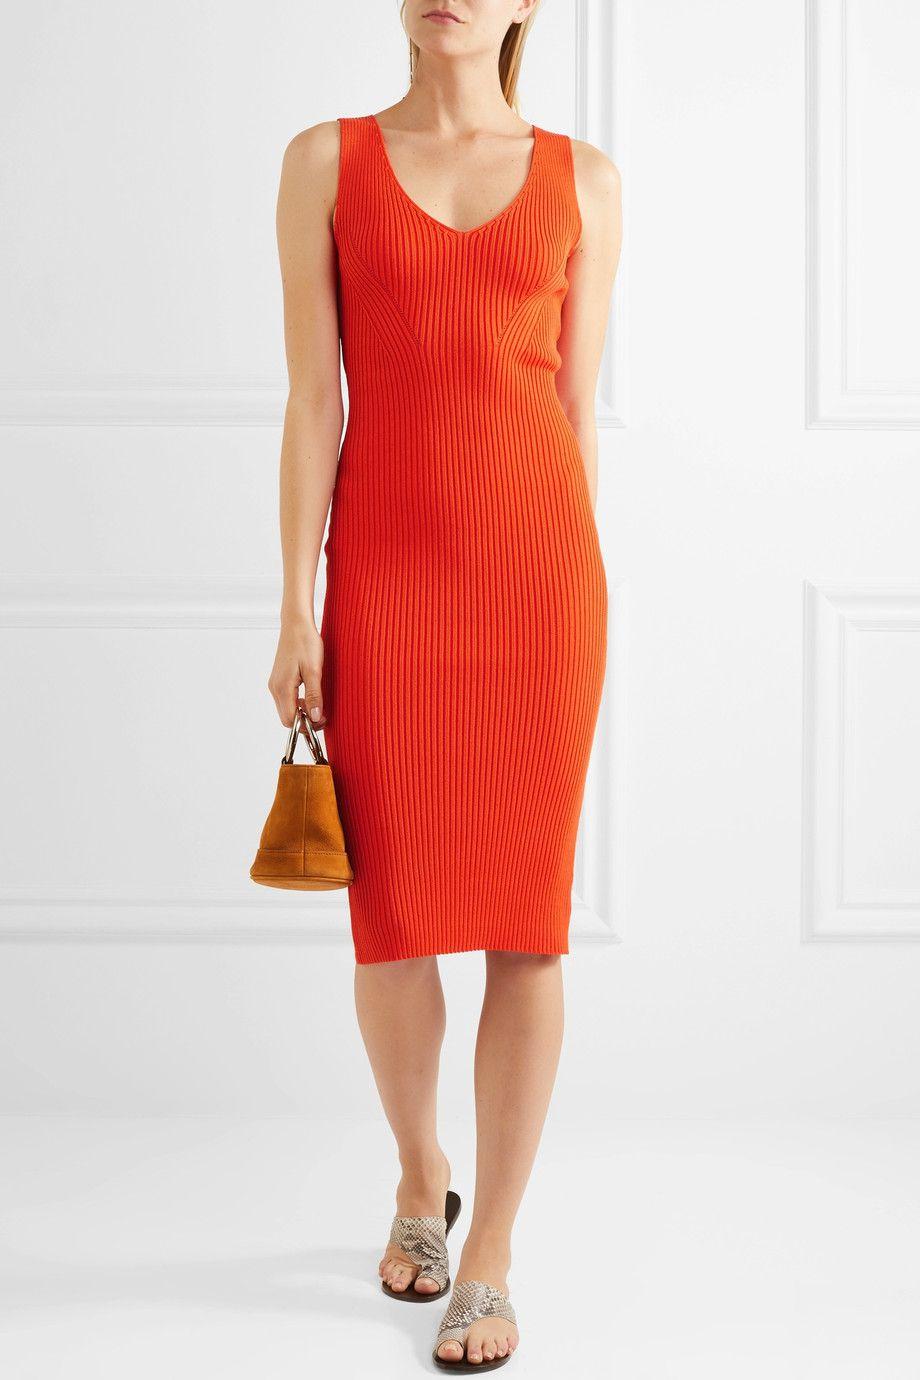 A model wearing a red knit dress